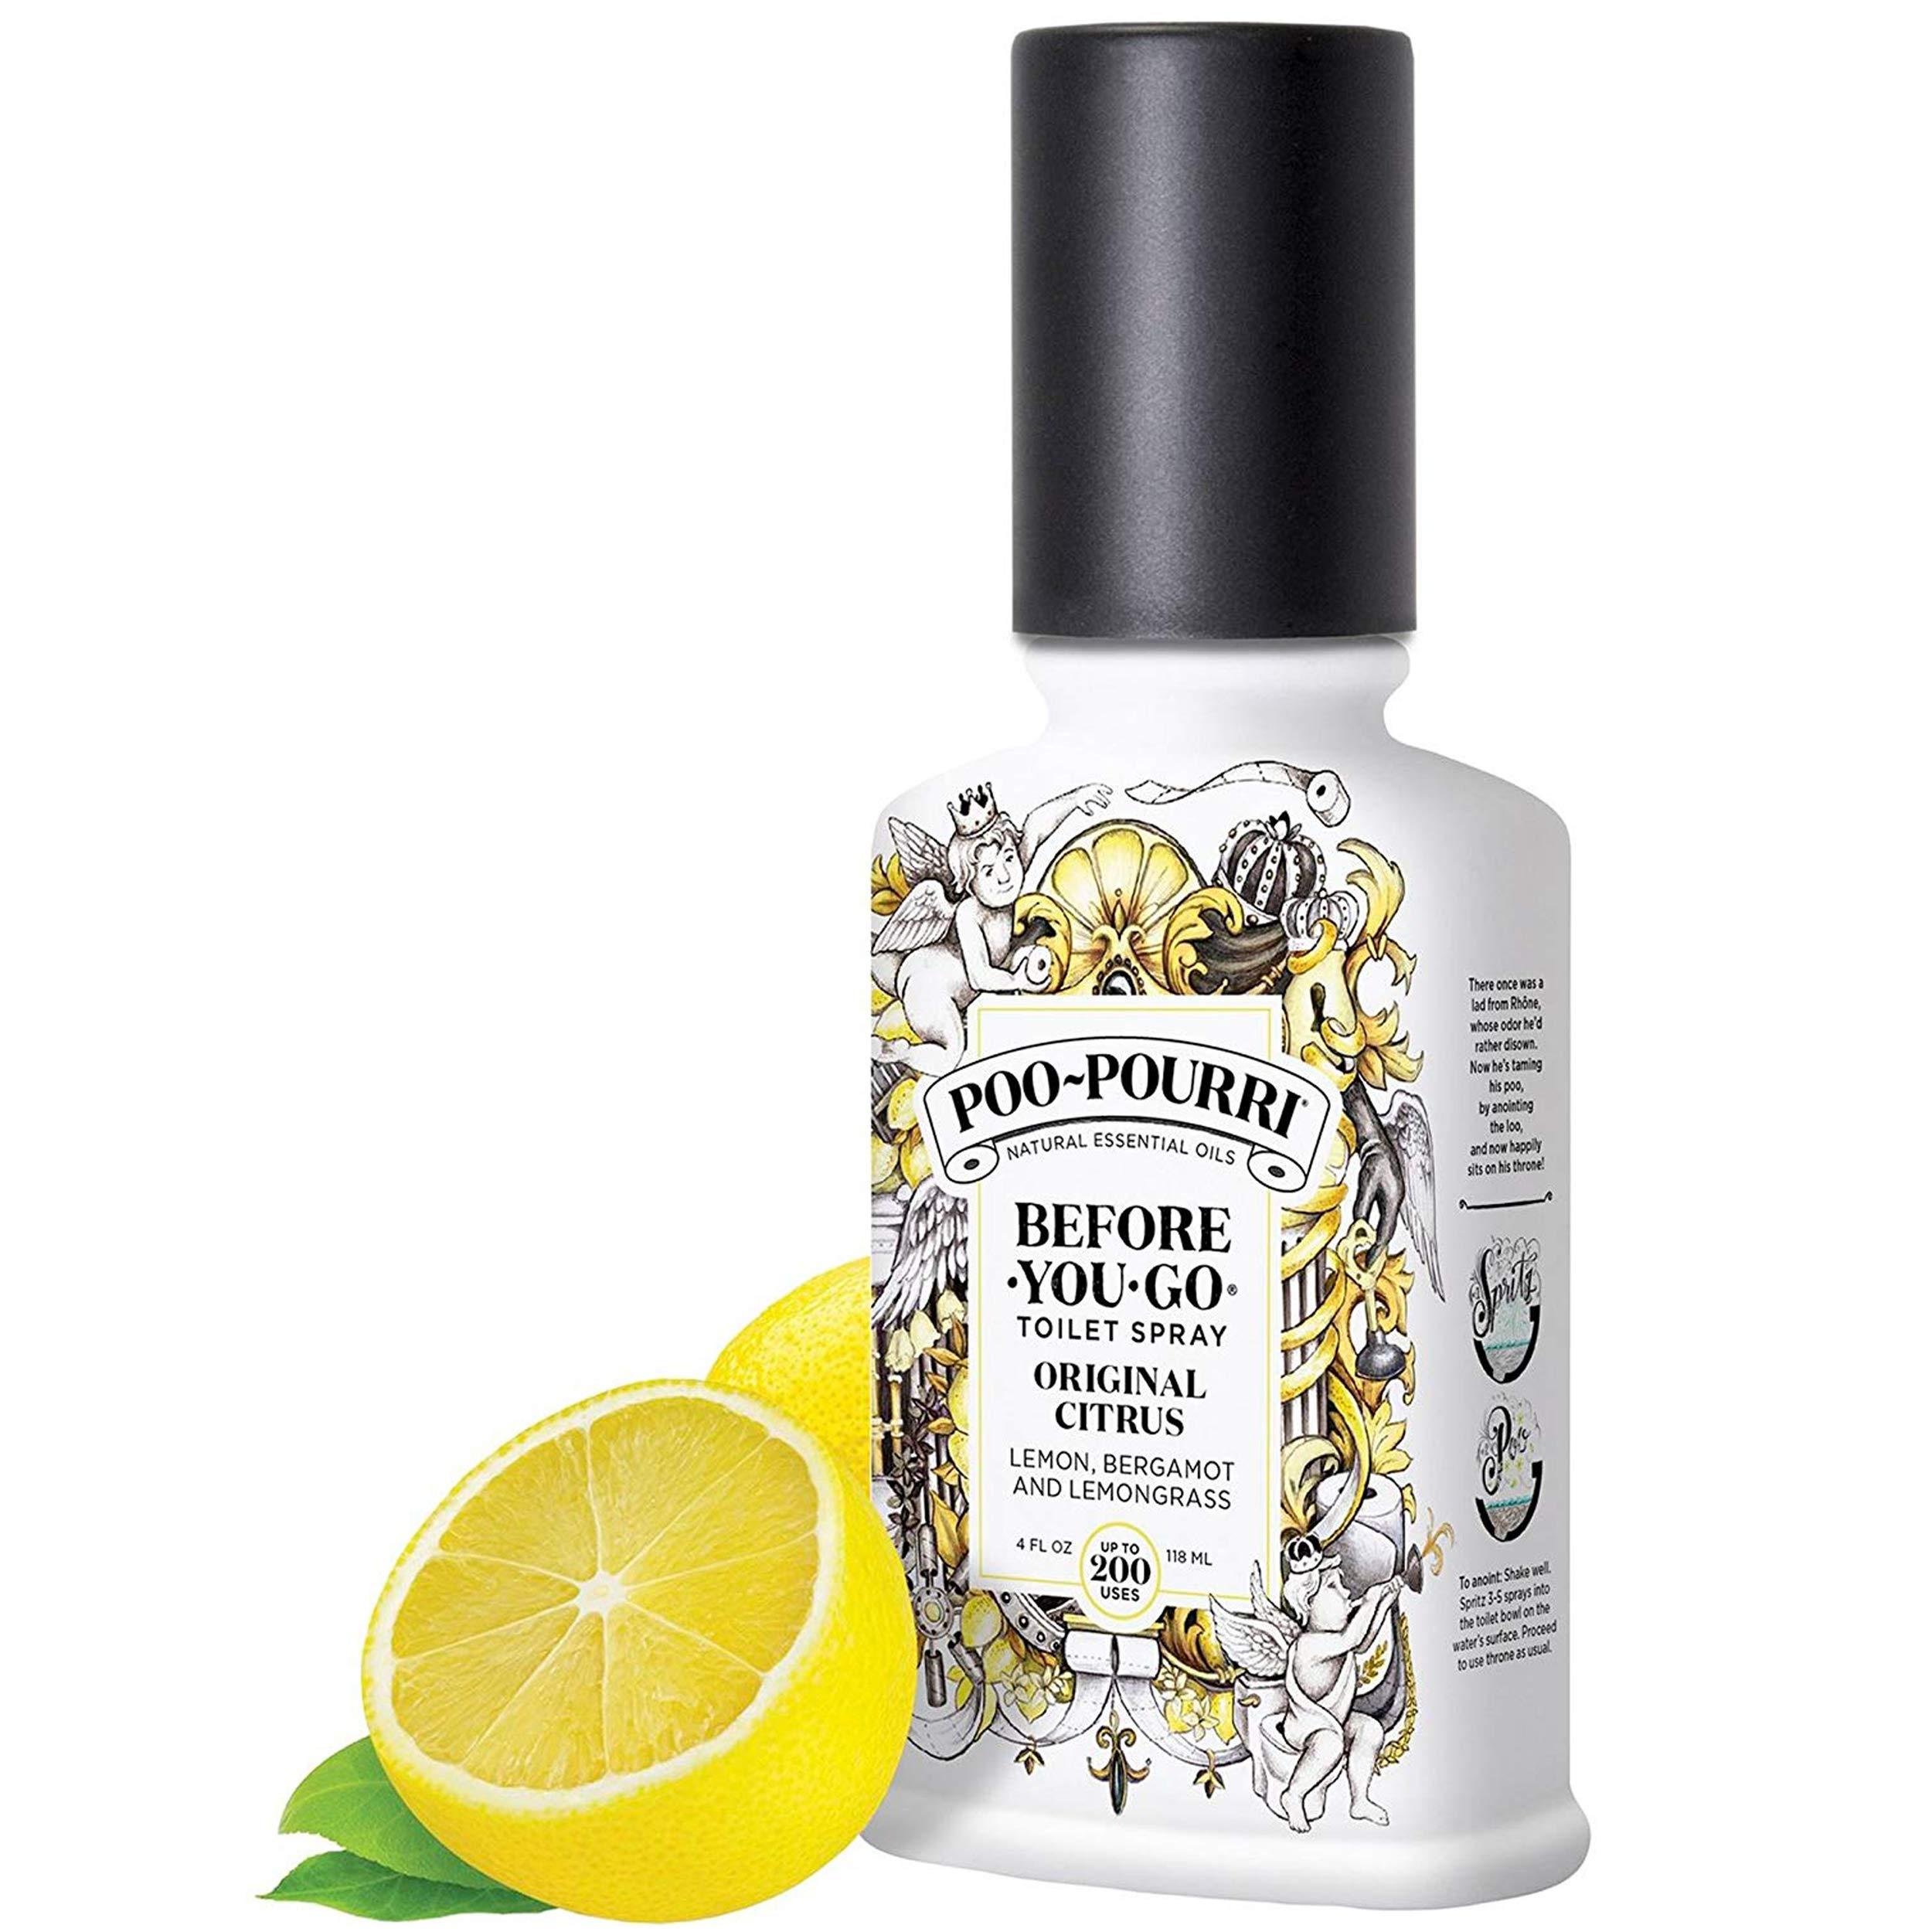 Poo-Pourri Before You Go Toilet Spray Original Citrus, Lavender Vanilla and Sitting Pretty 4 Ounce Bottles by Poo-Pourri (Image #6)